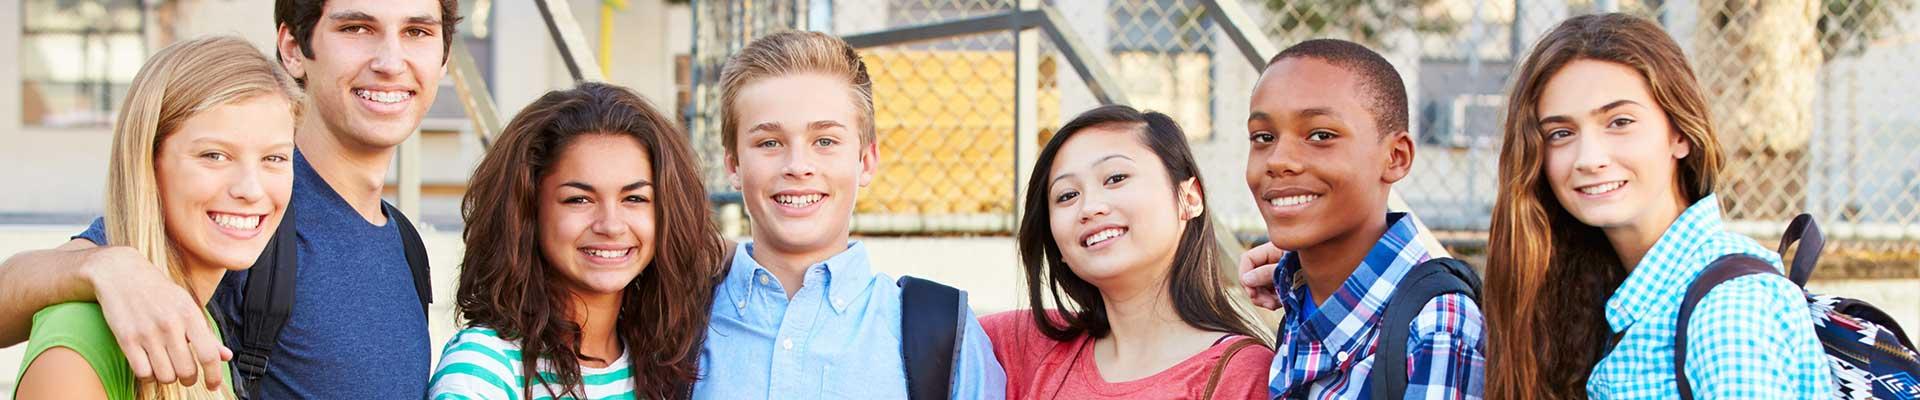 Adolescent Orthodontics Flanagan Orthodontics Ringgold GA